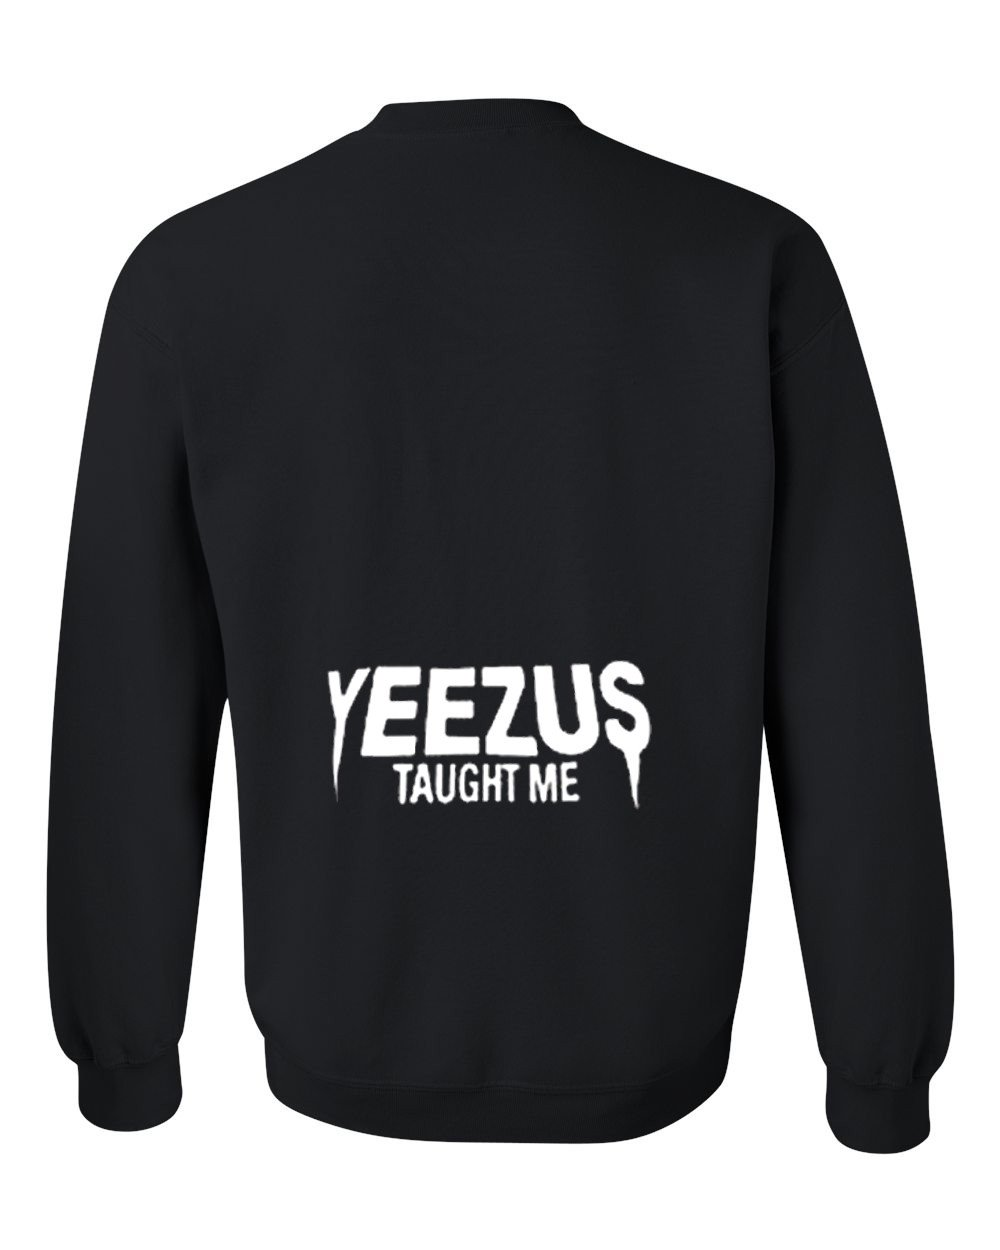 yeezus taught me sweatshirt back